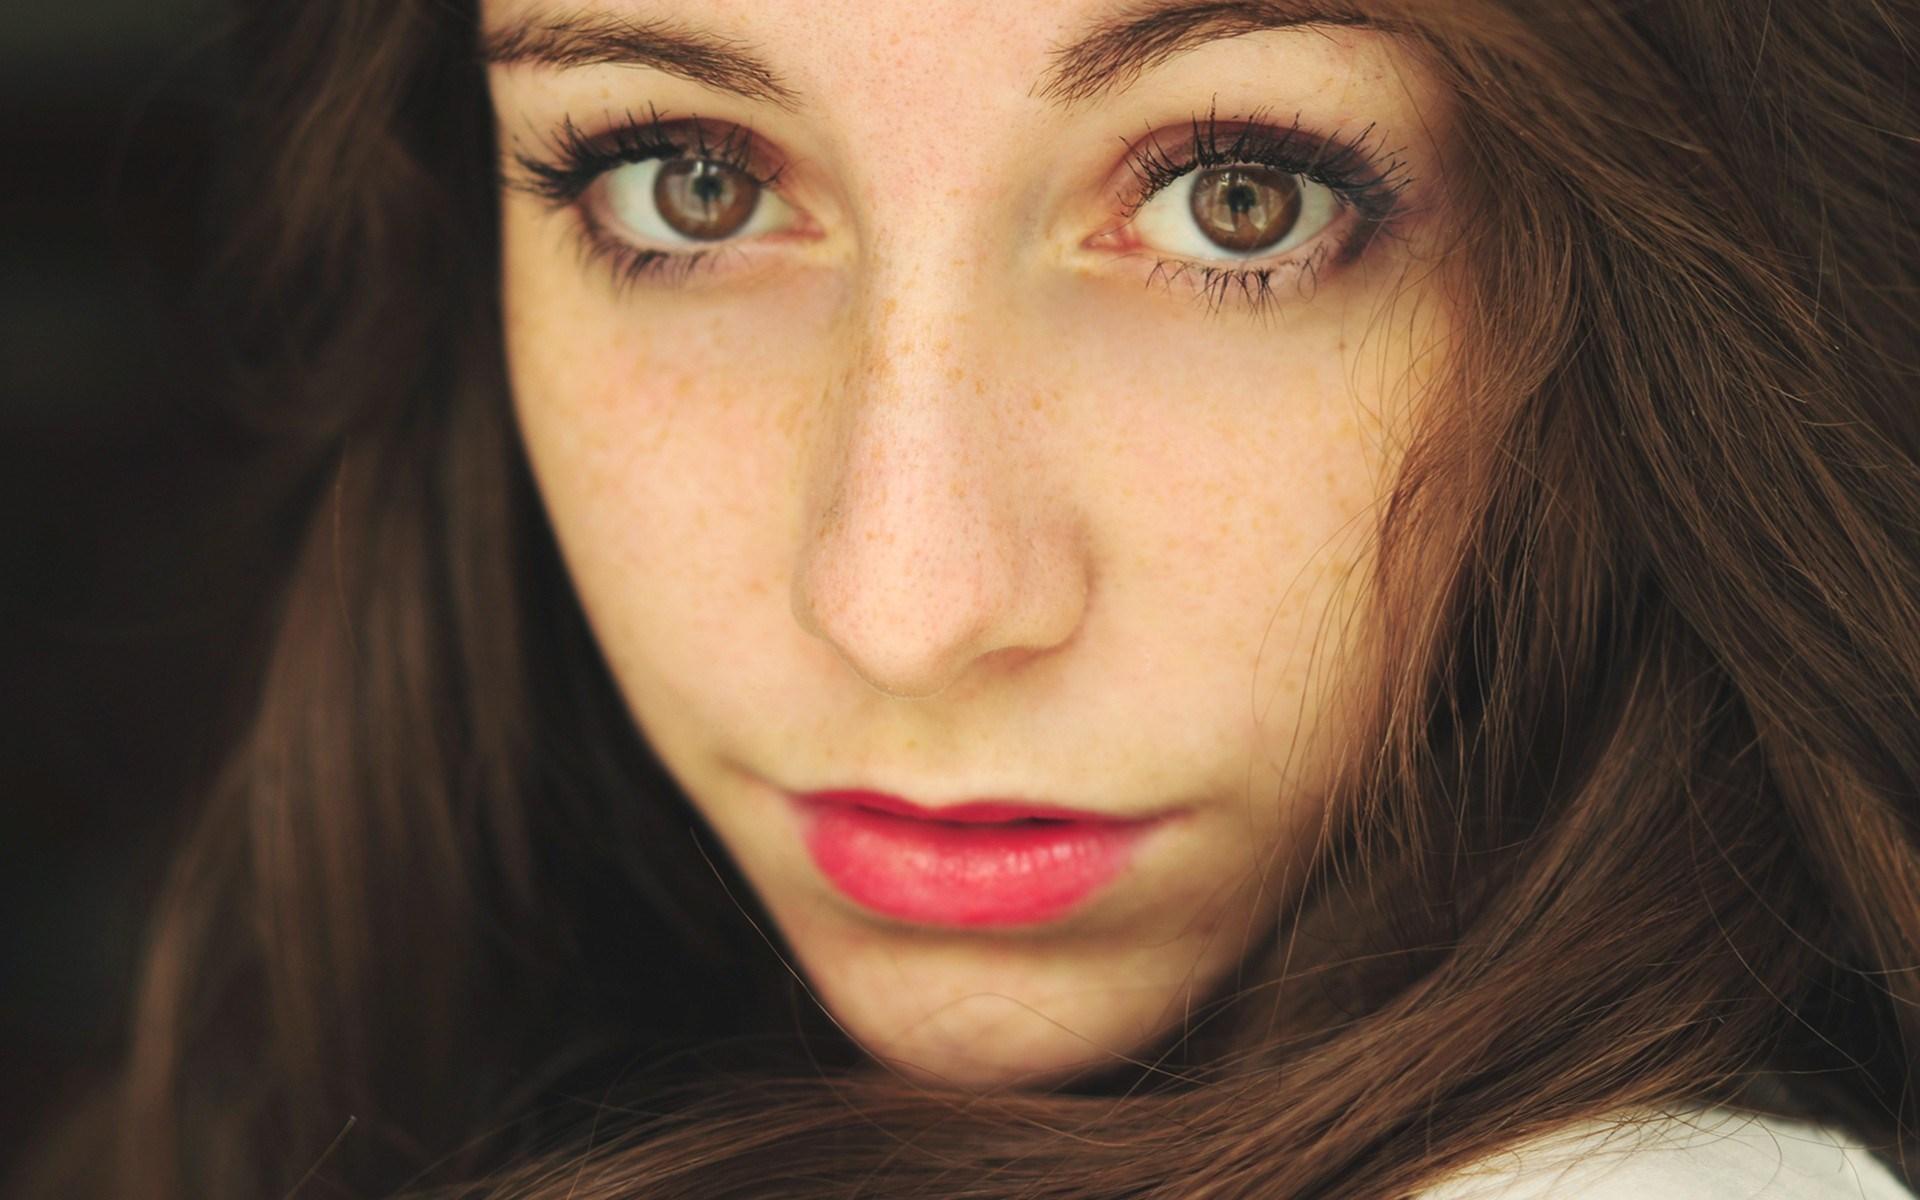 Girl Close Up Photography - HD Wallpaper